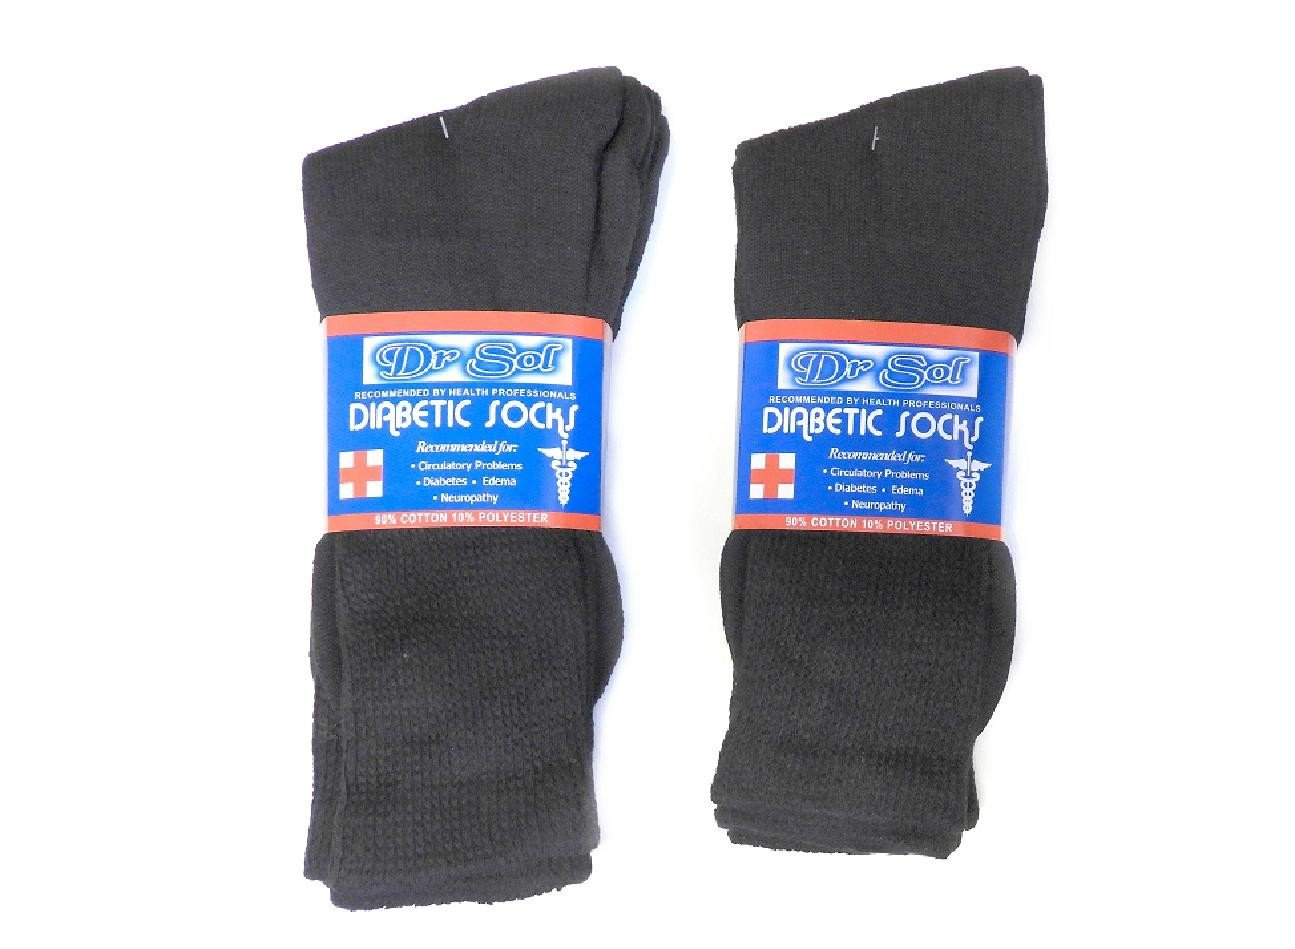 6 Pair 90% Cotton Blend Diabetic Socks Men's Women's The Choice of Health Professionals (Ladies 9-11)